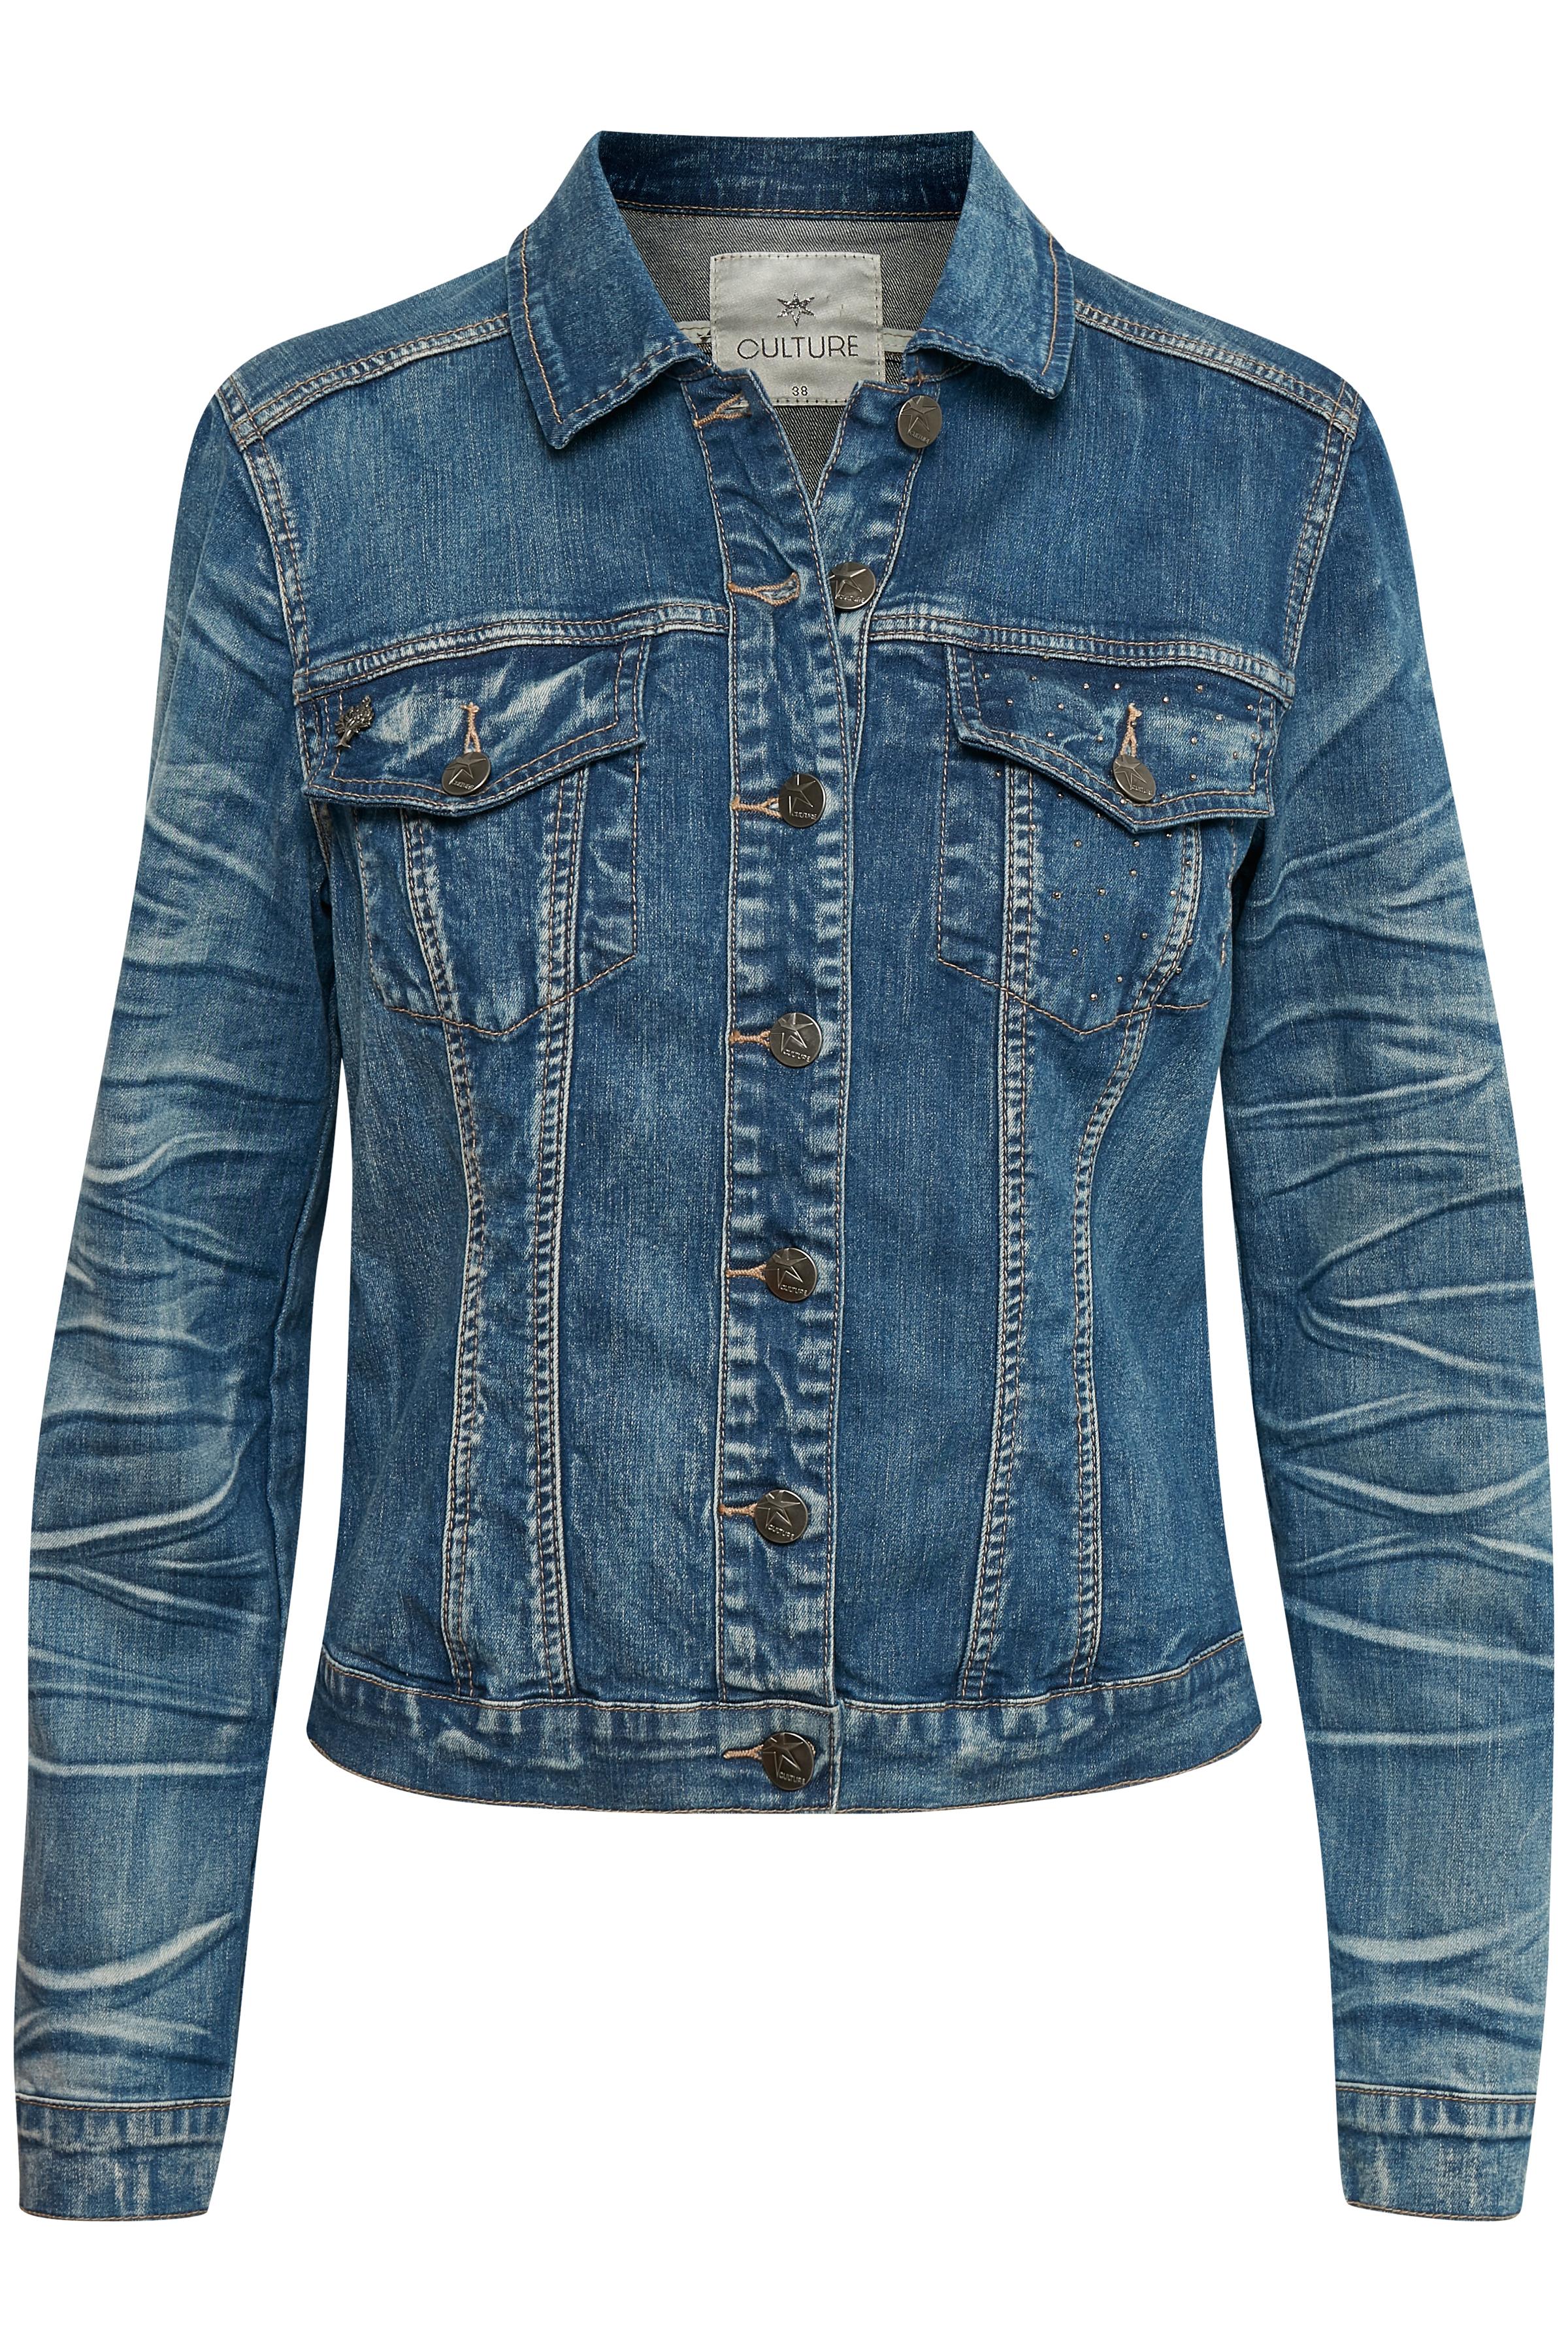 Culture Dame Denim jakke - Denimblå